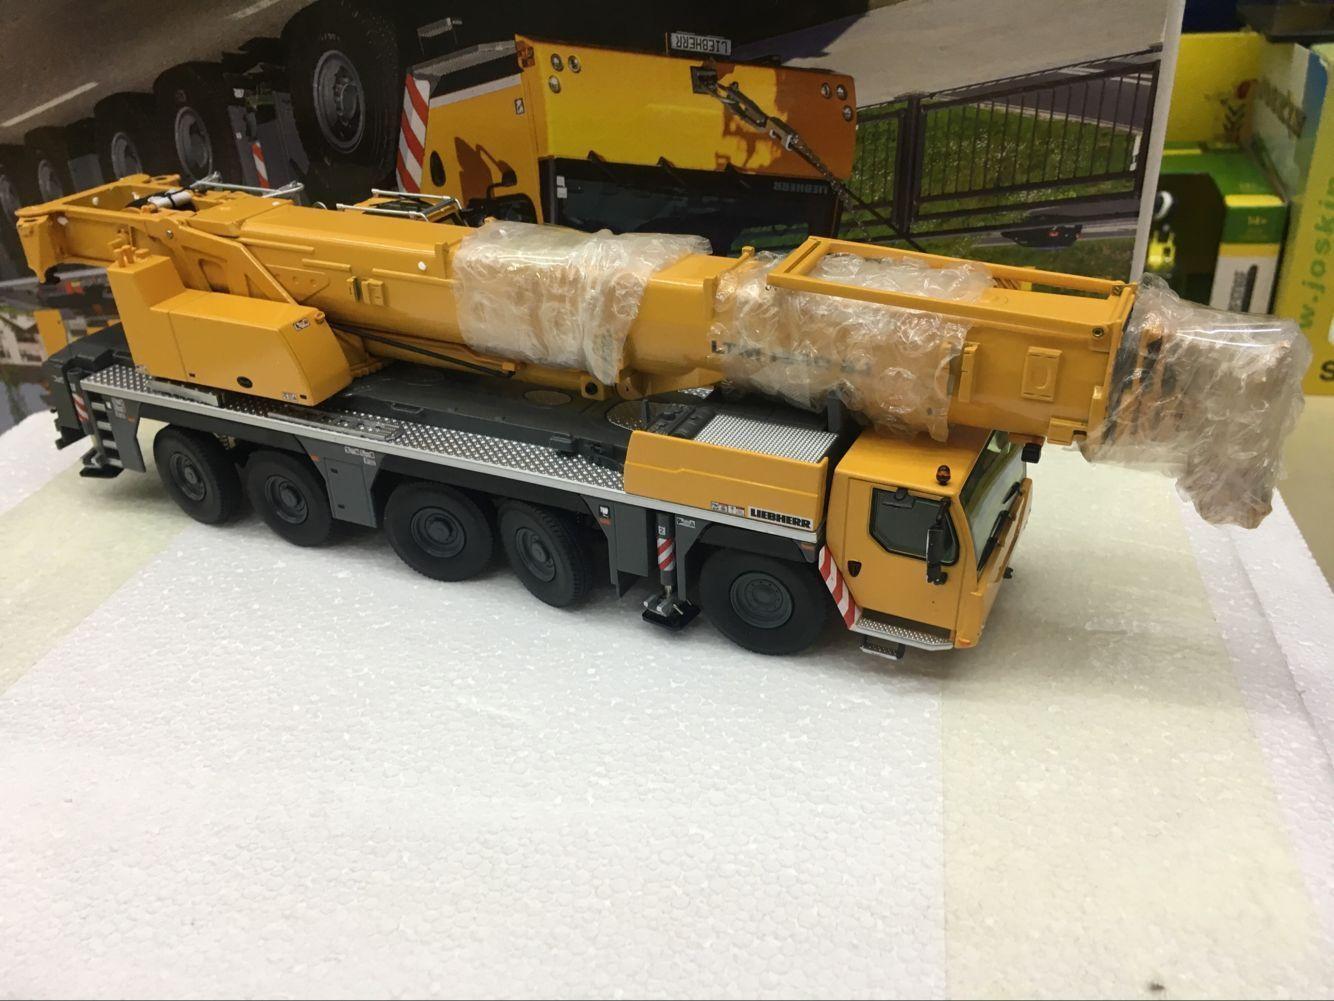 Nzg 959 Liebherr Ltm 1250 5 1 Mobile Crane Liebherr Livery Scale 1 50 Crane Crawler Crane Scale